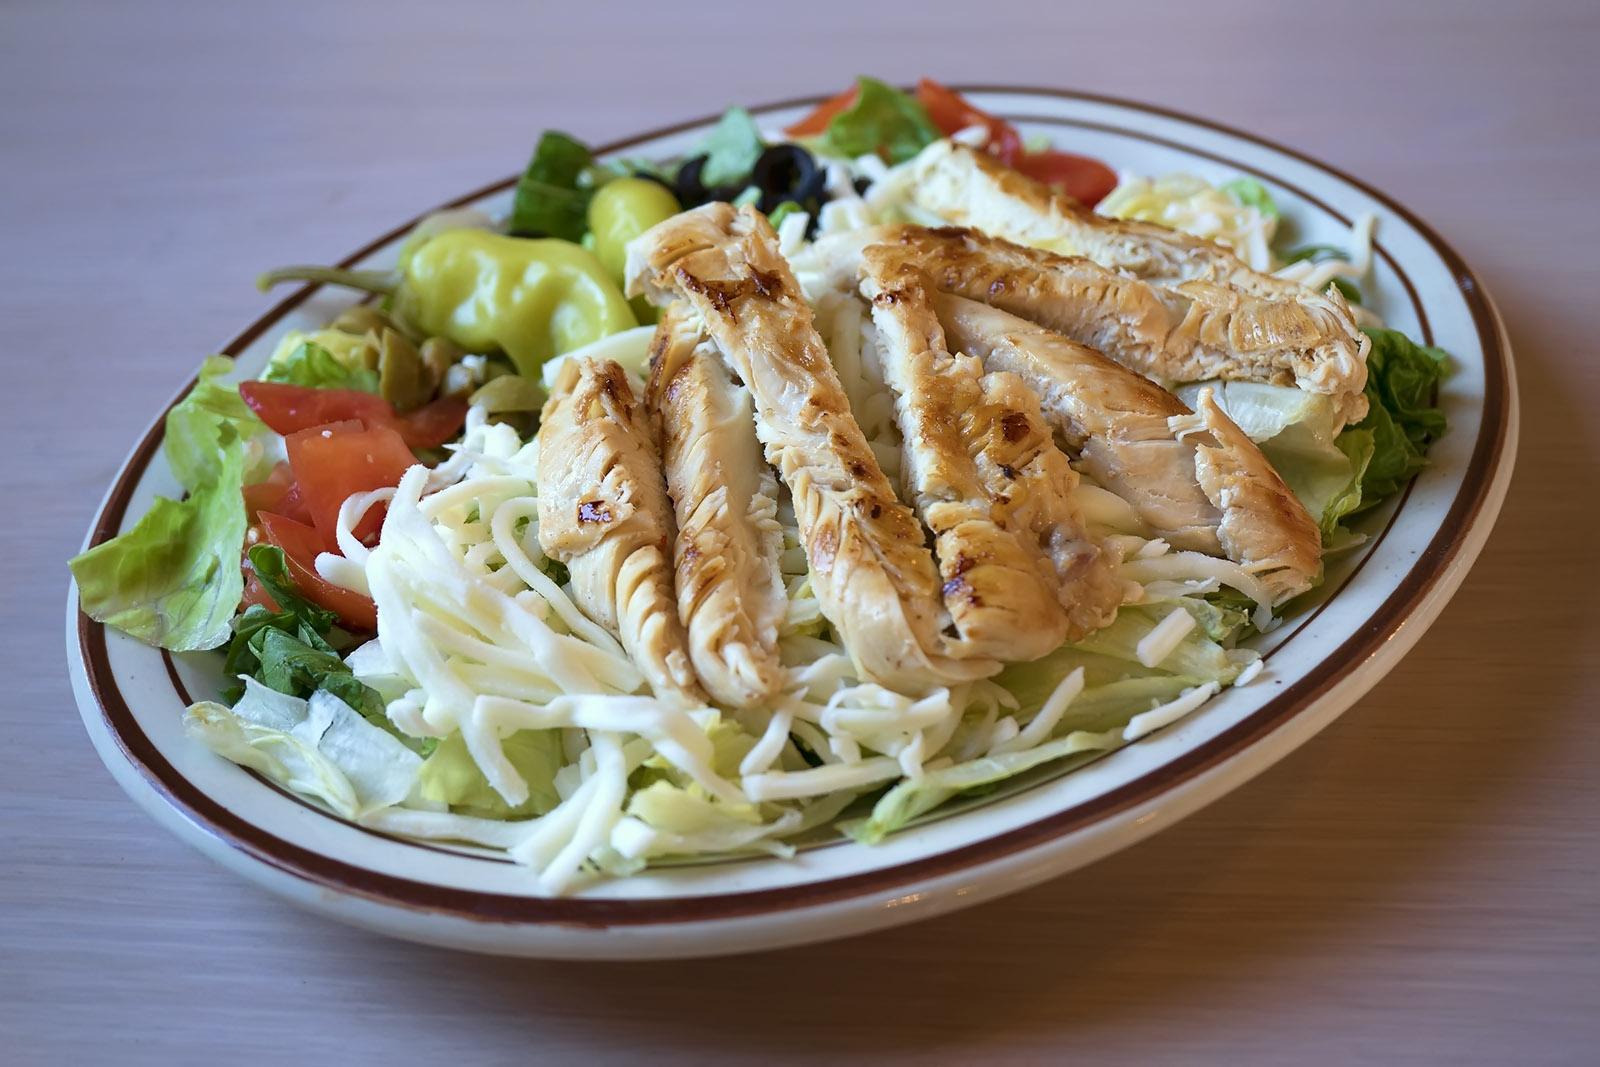 Grilled Chicken Salad Image